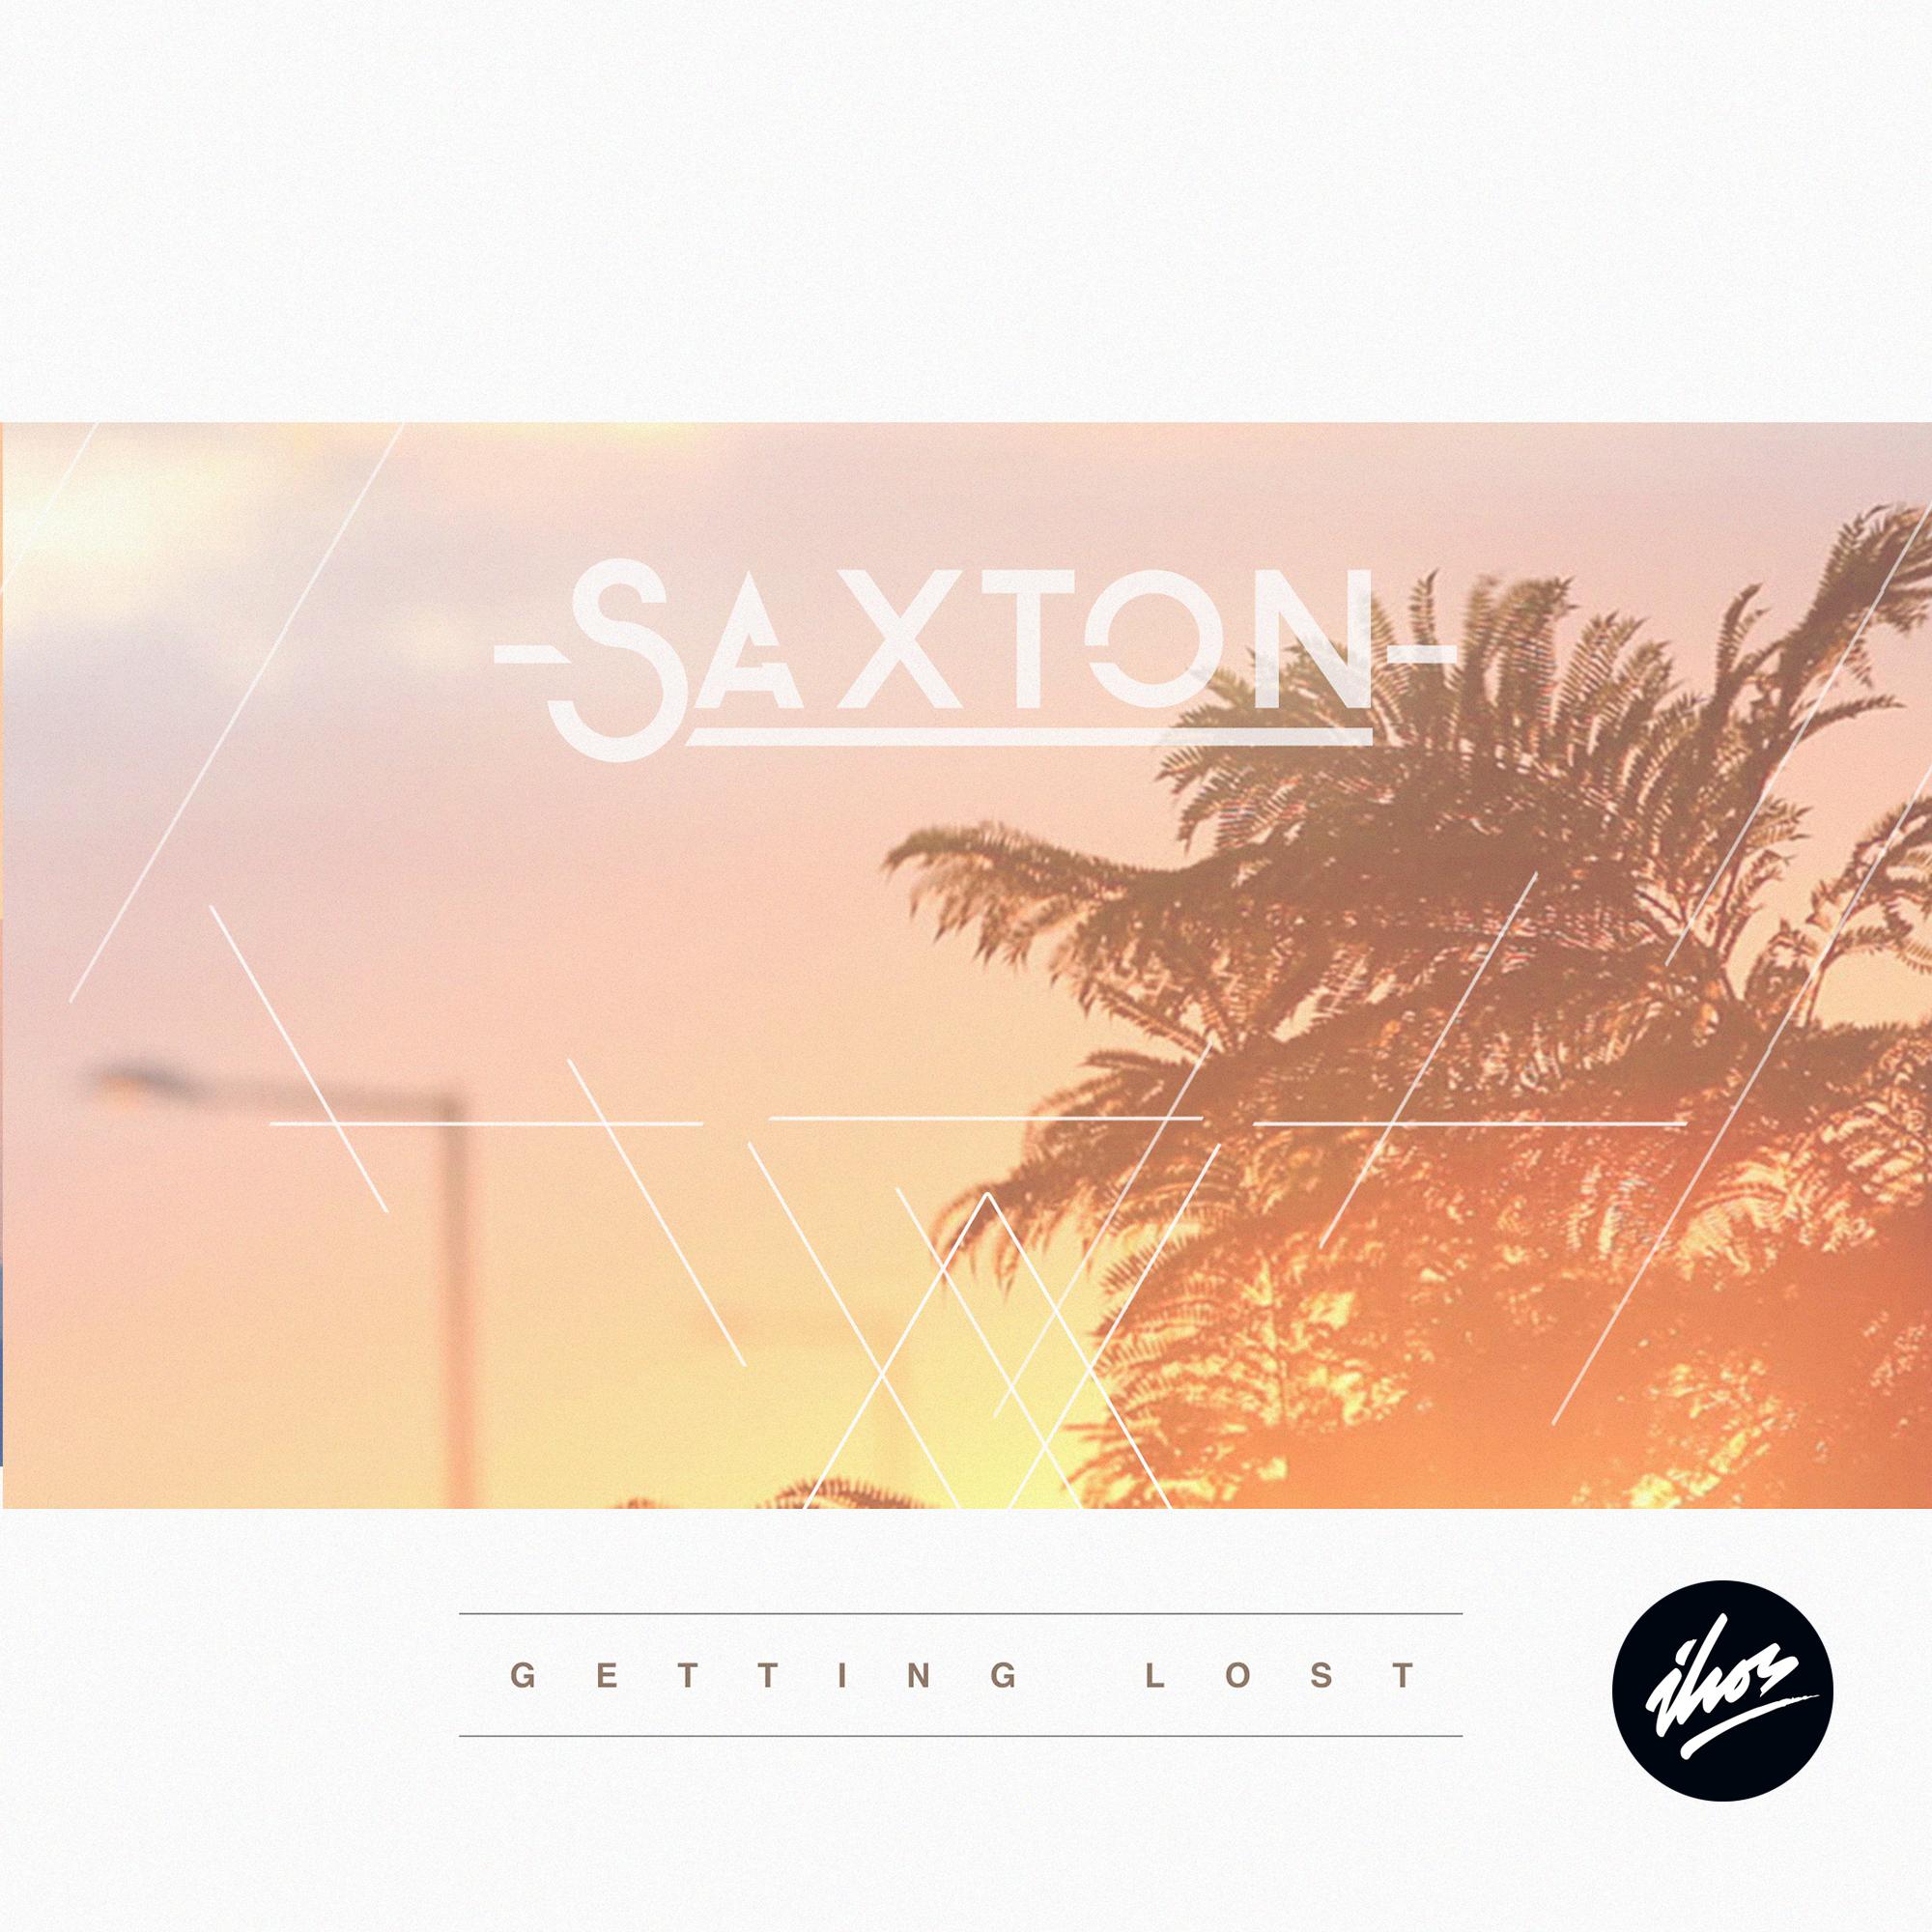 Saxton - Getting Lost